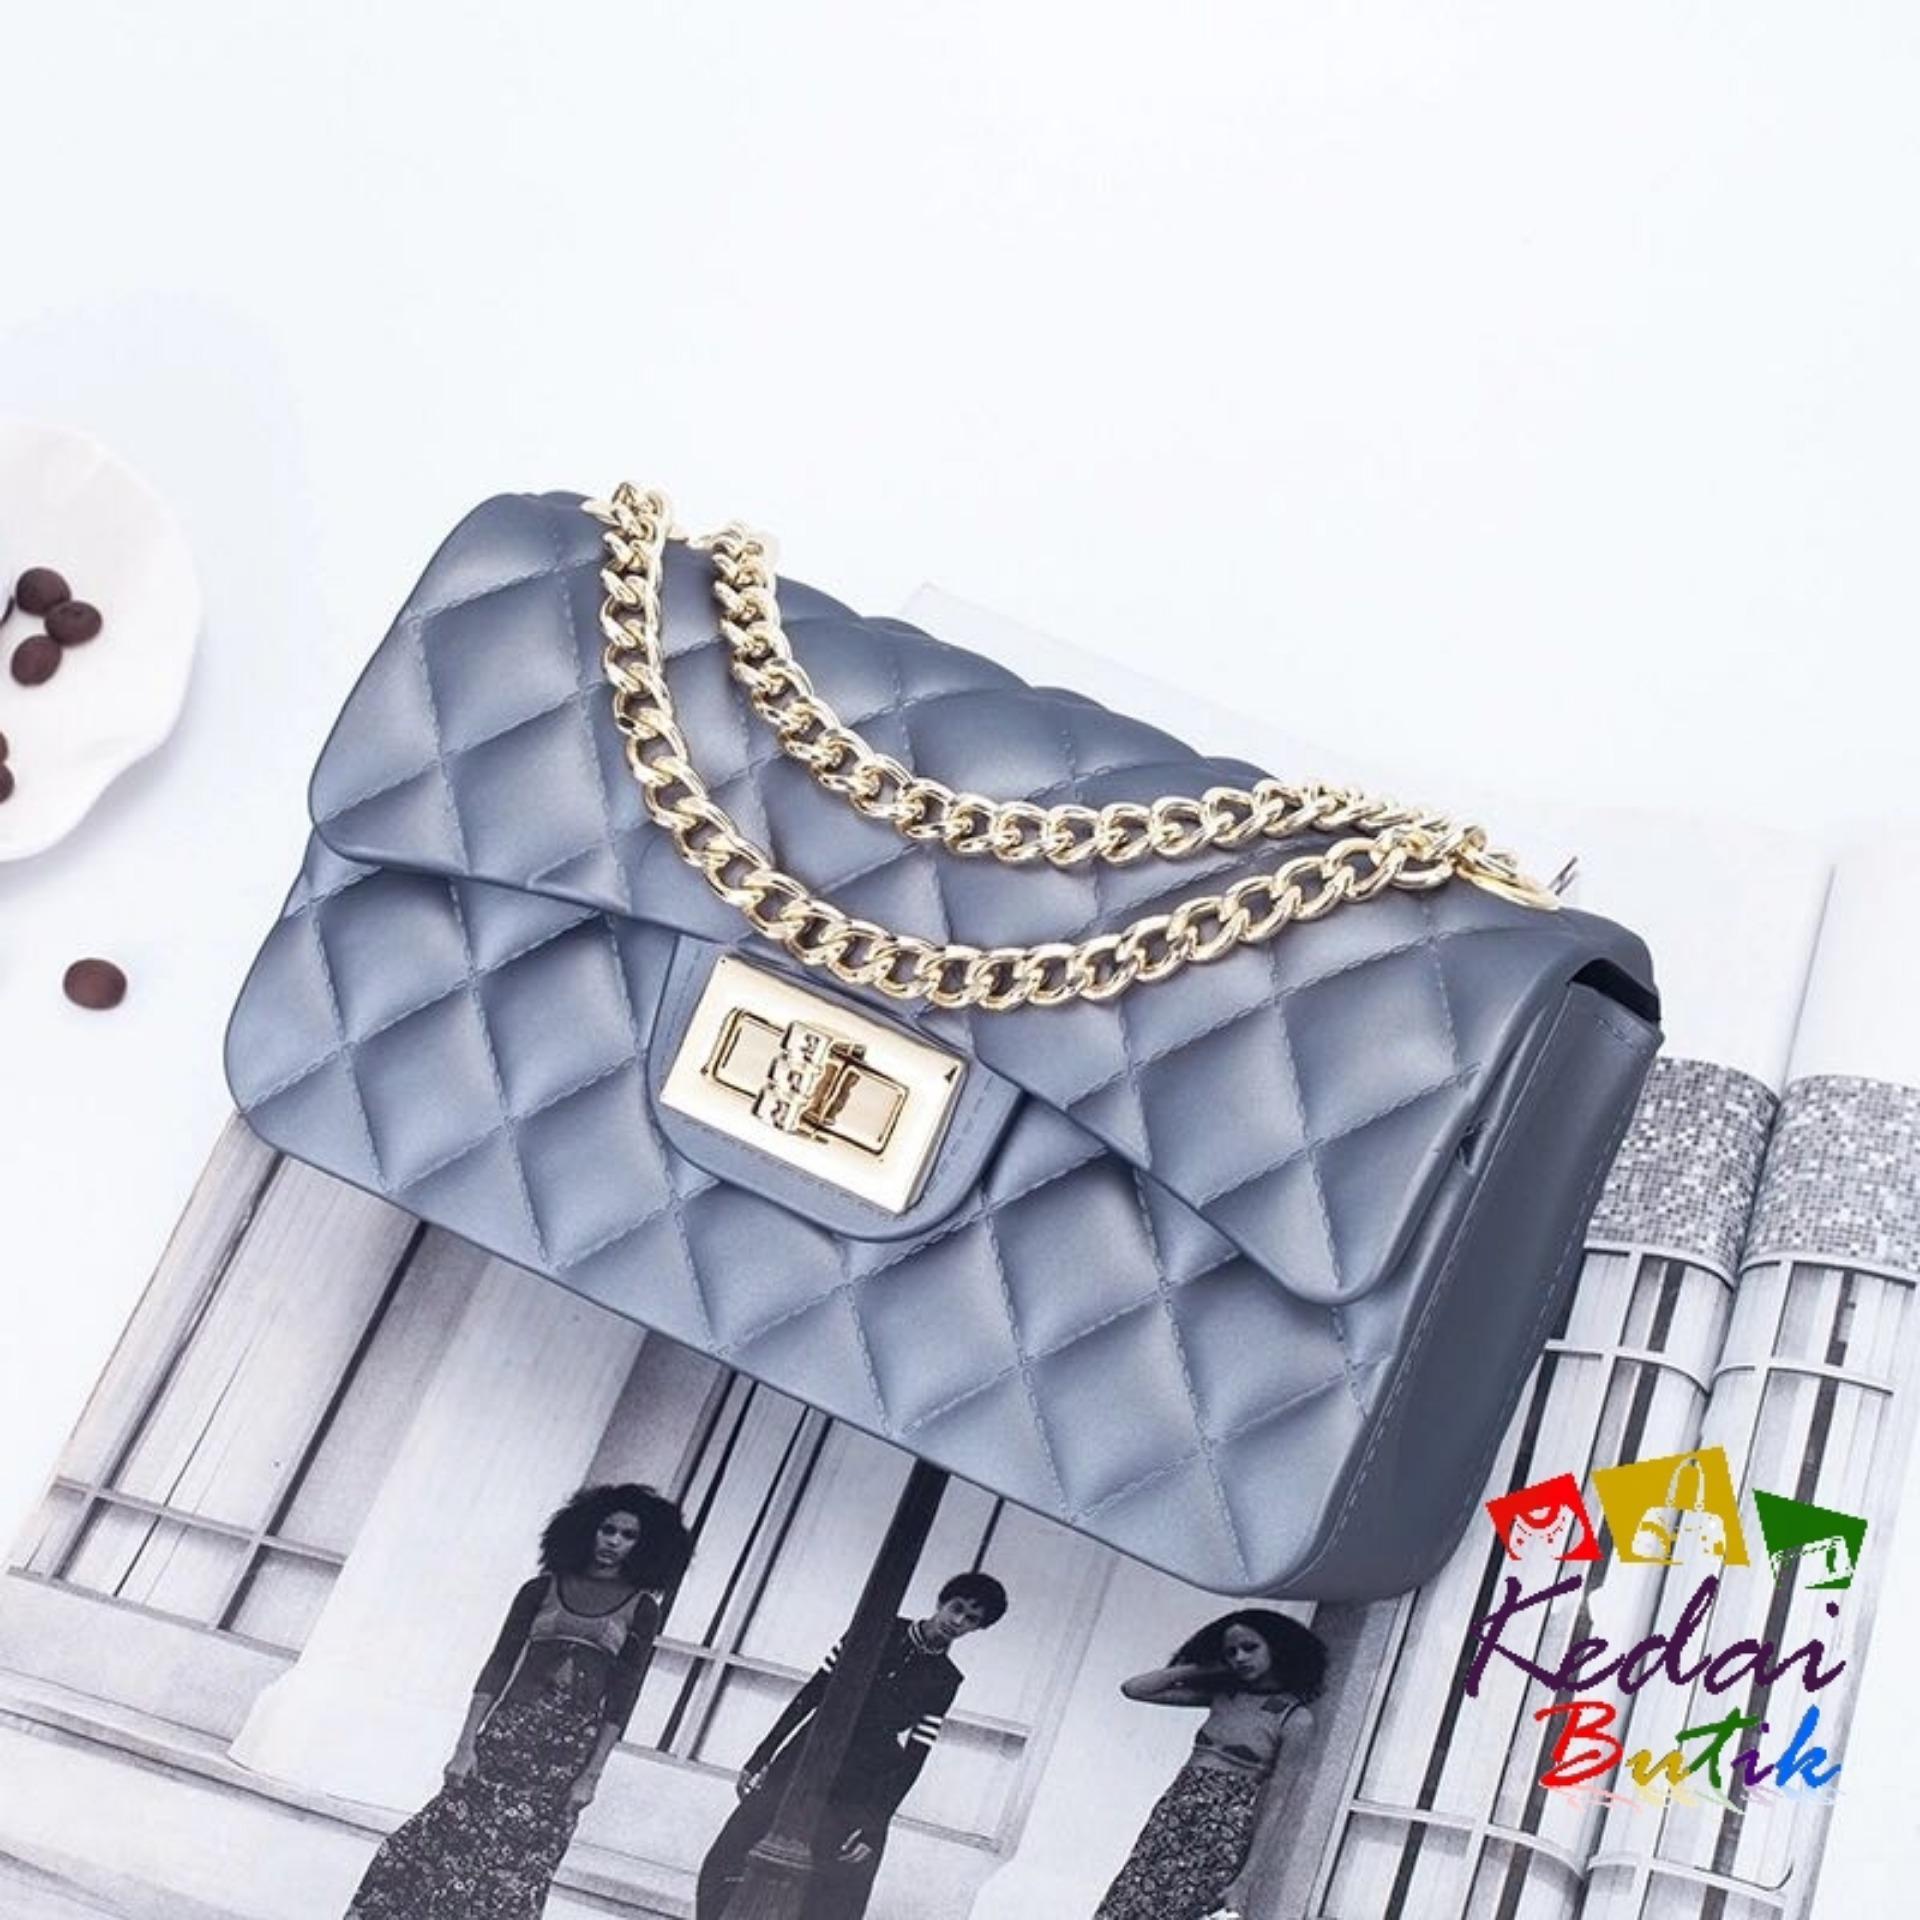 Kedaibutik-002 KECIL Tas Jelly Matte Maxi channel   Tas Jelly Murah   Tas  Jelly bb5bdf06d9